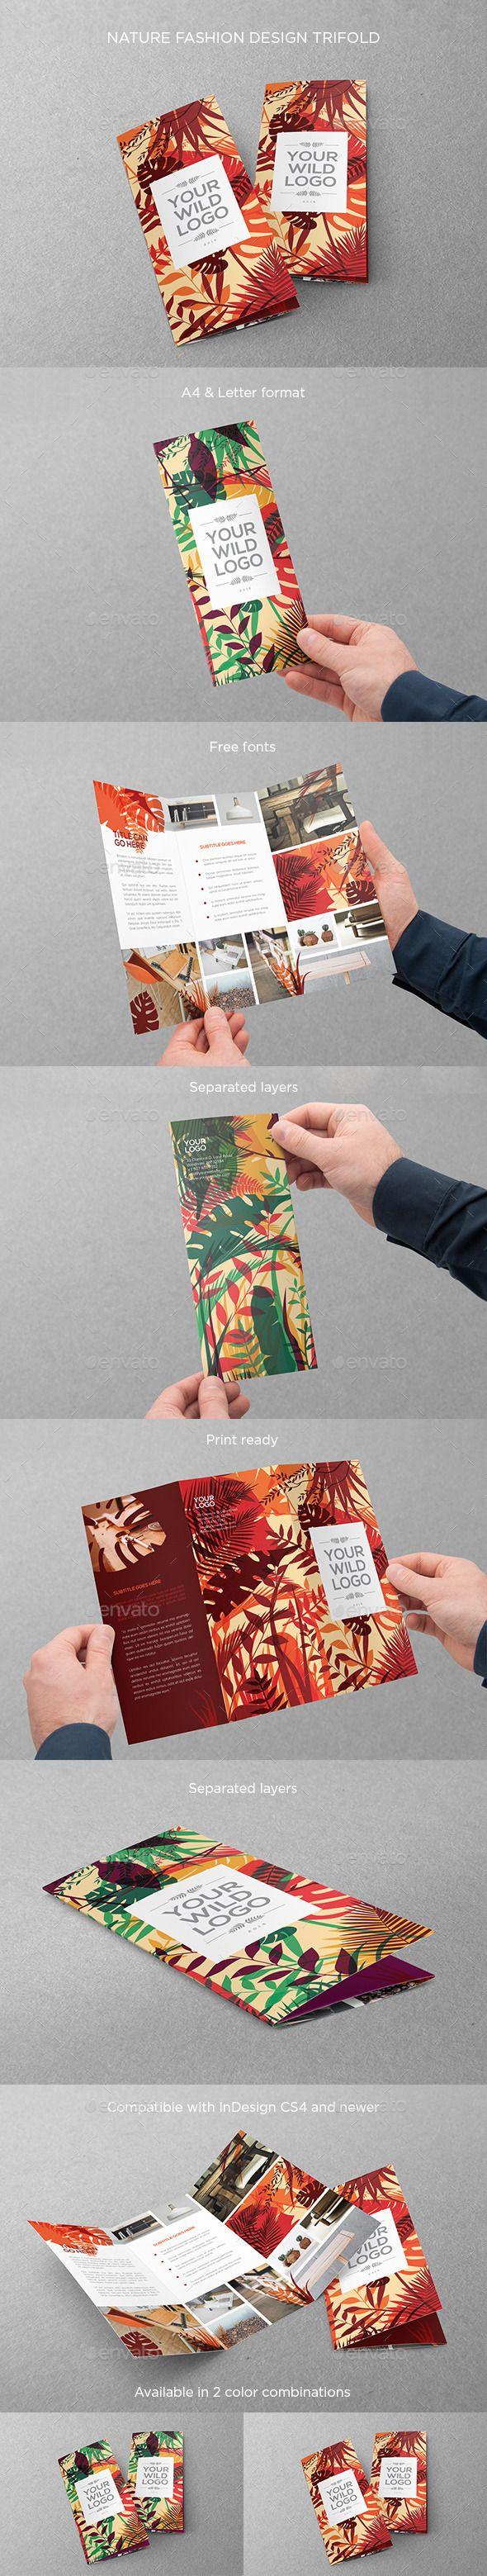 Nature Fashion Design Trifold - Brochures Print Templates